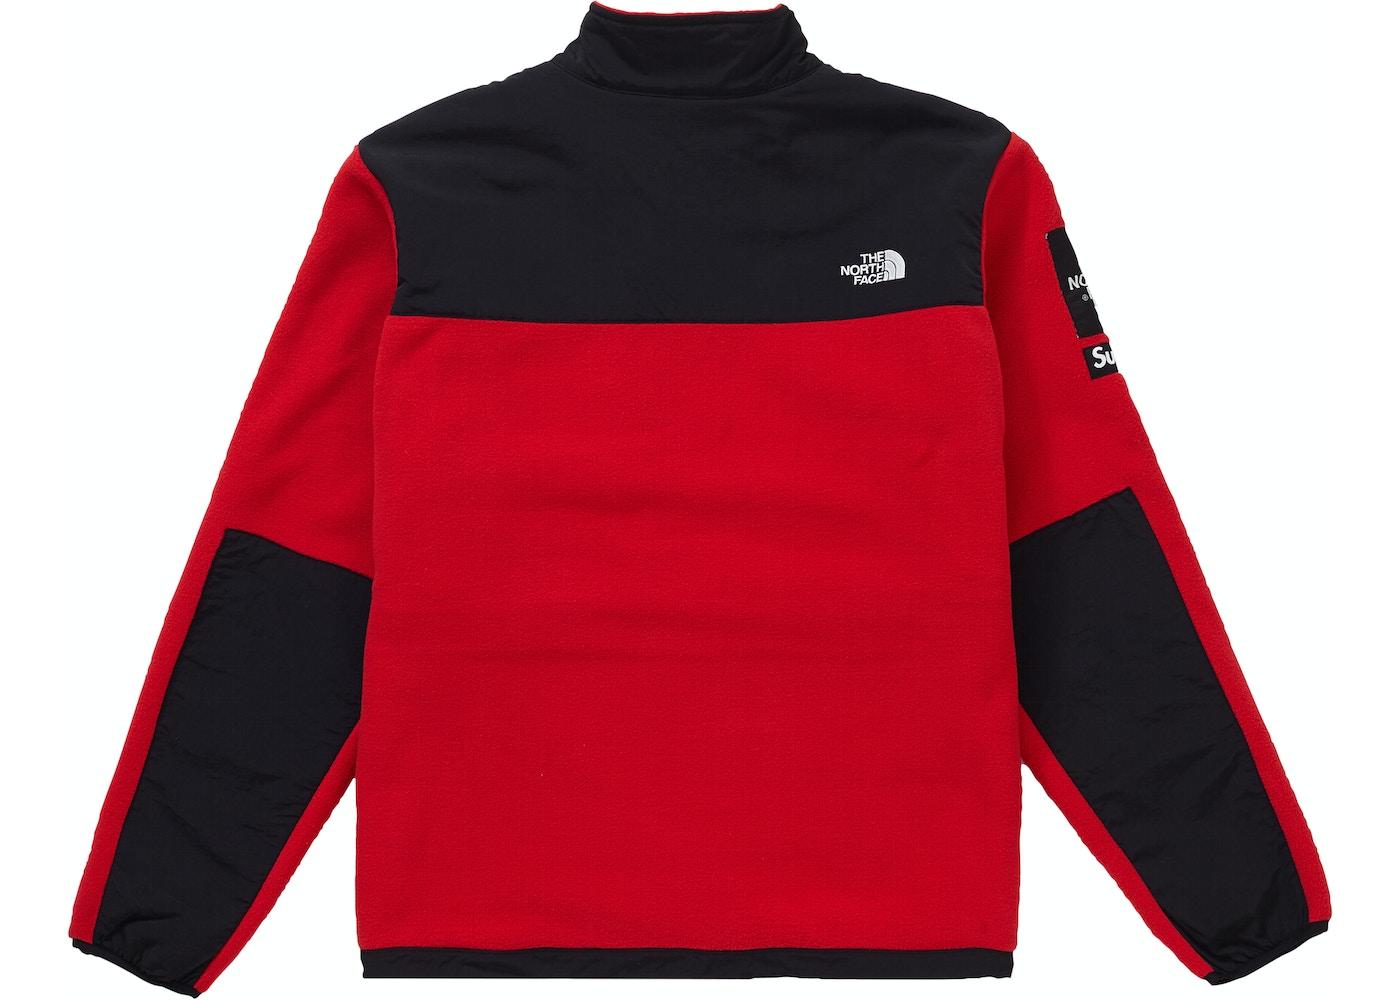 54b690a8 Supreme Jackets - Buy & Sell Streetwear